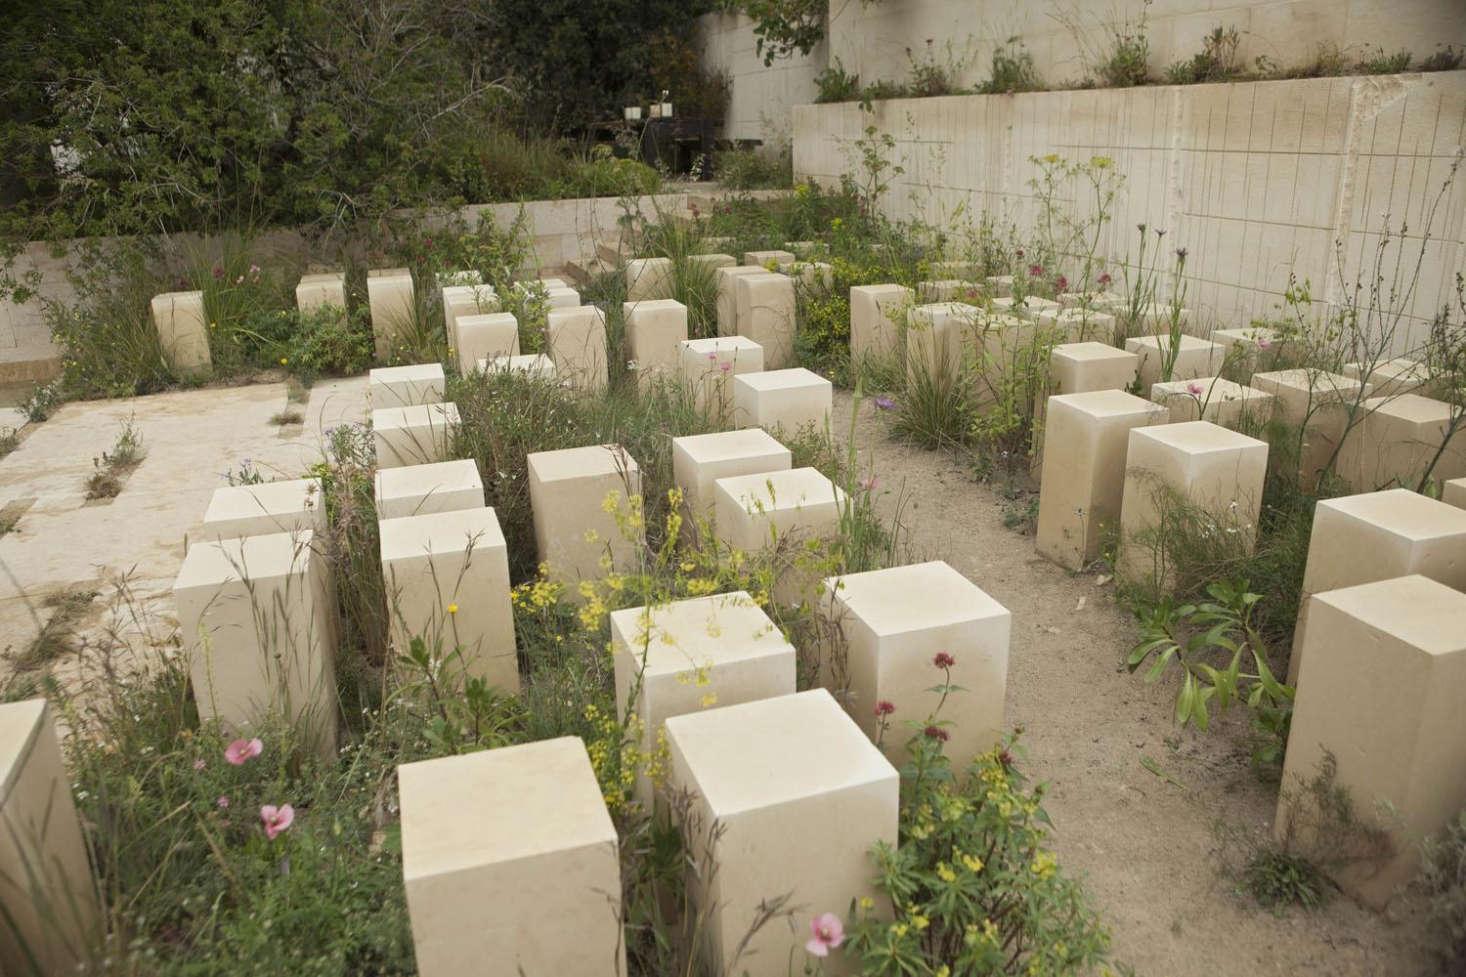 Quarry Shade Garden At Bon Air Park: A Rich Seam: Quarry Gardening At The Chelsea Flower Show